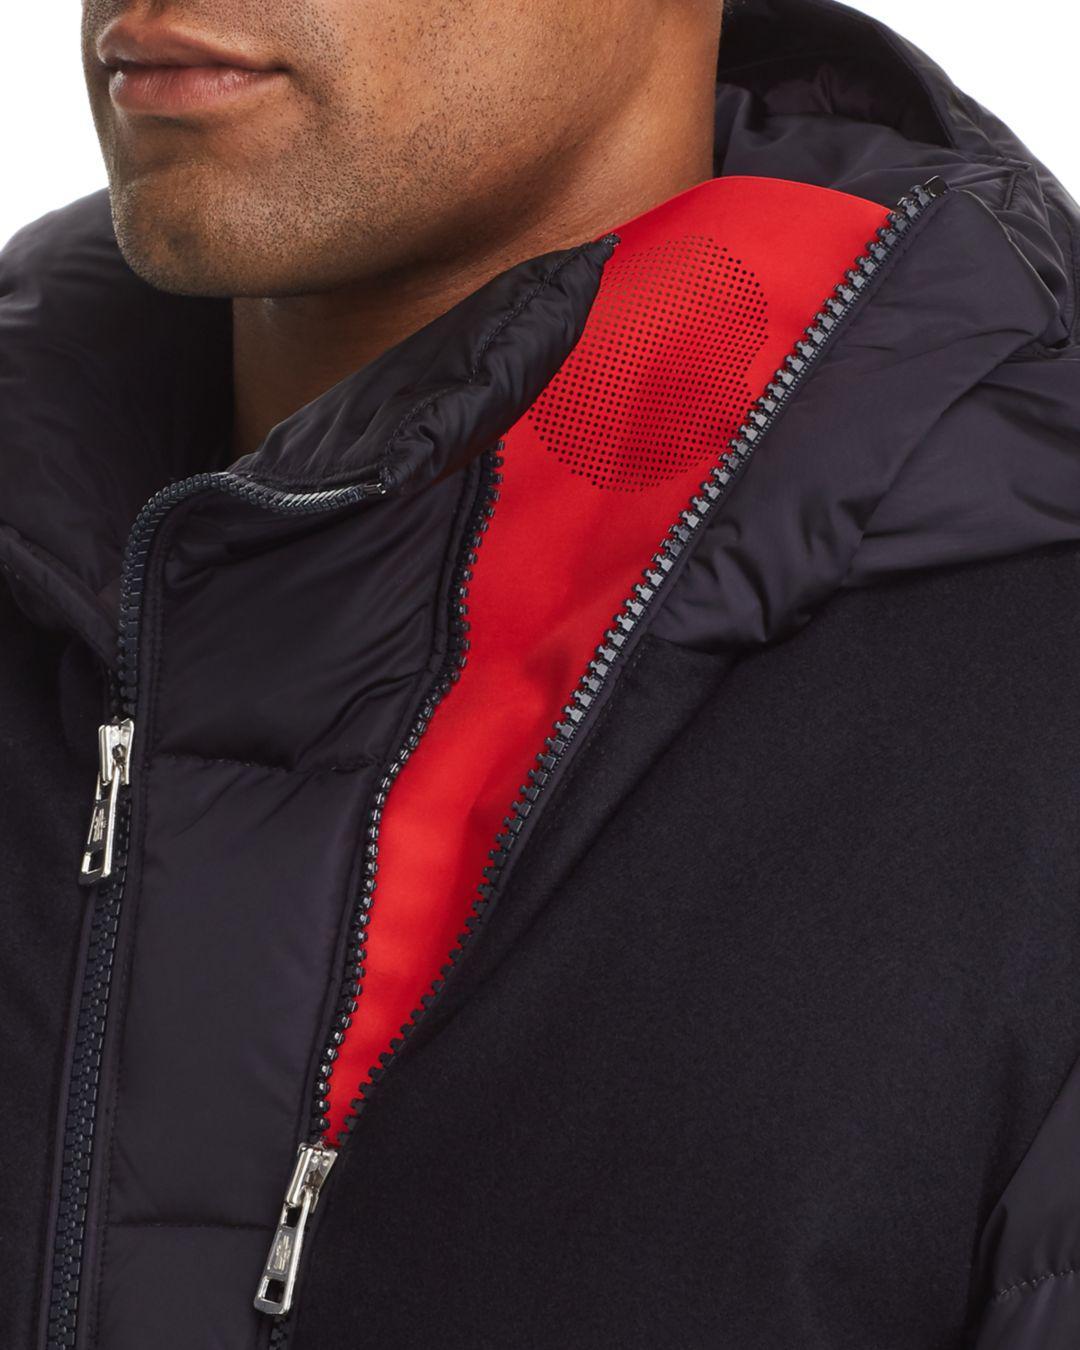 d0c5bb2e7 free shipping moncler coat bloomingdale michigan 58f8c 27775